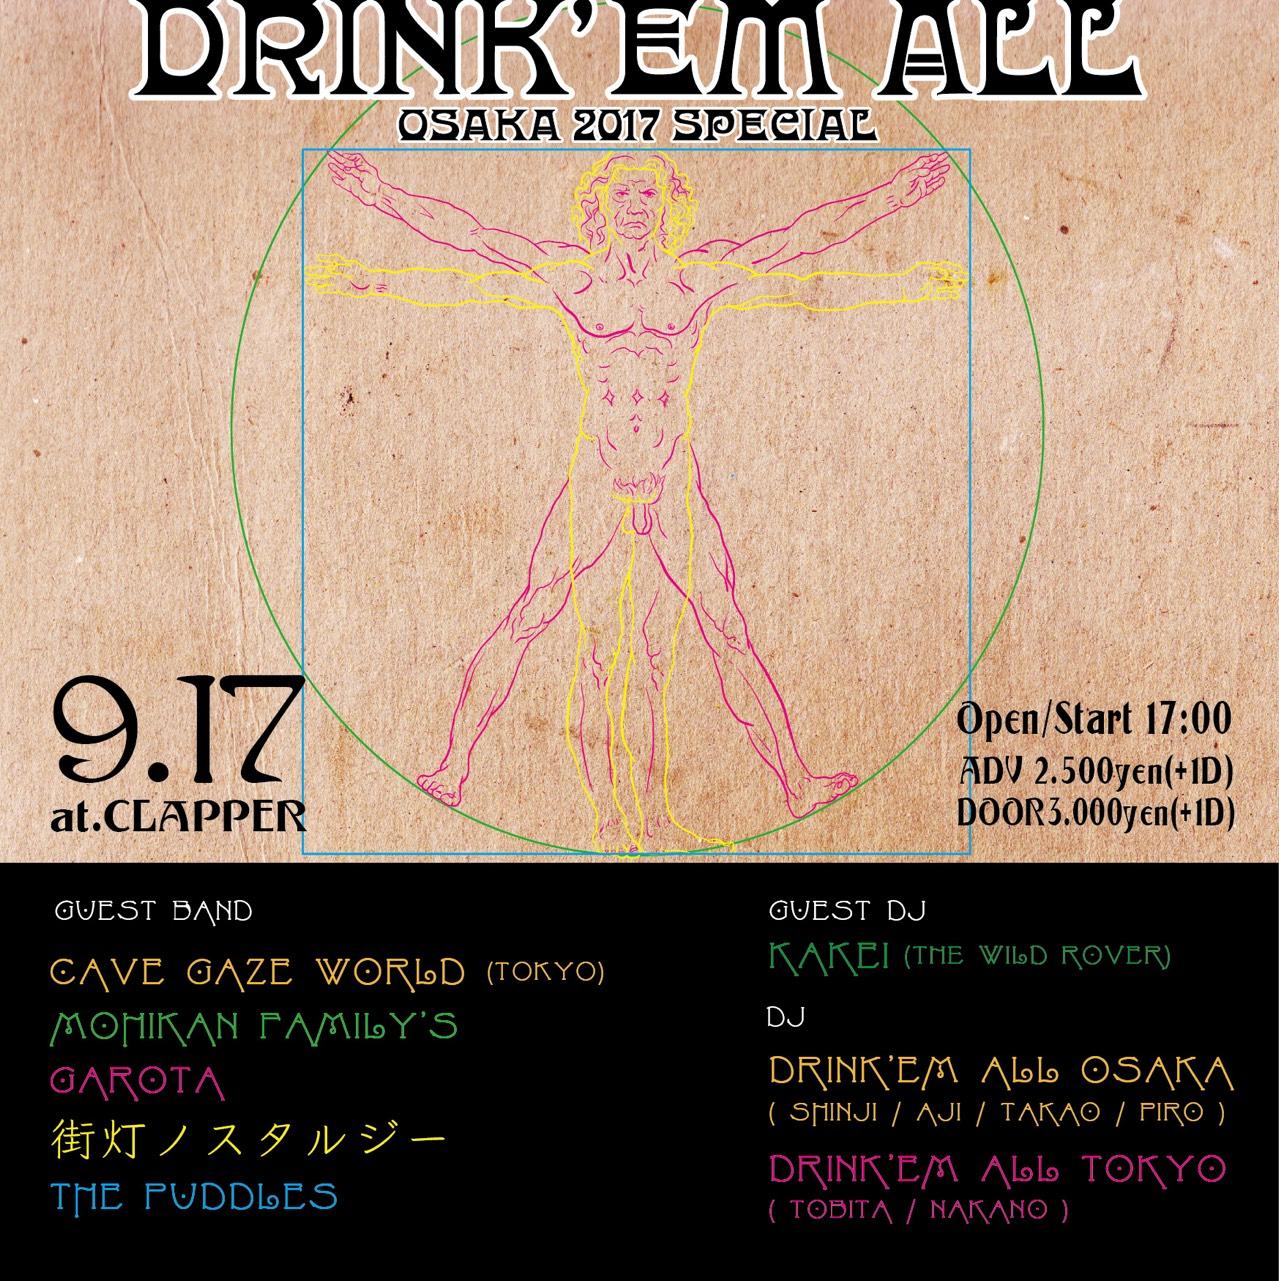 DRINK'EM ALL OSAKA 2017 Special